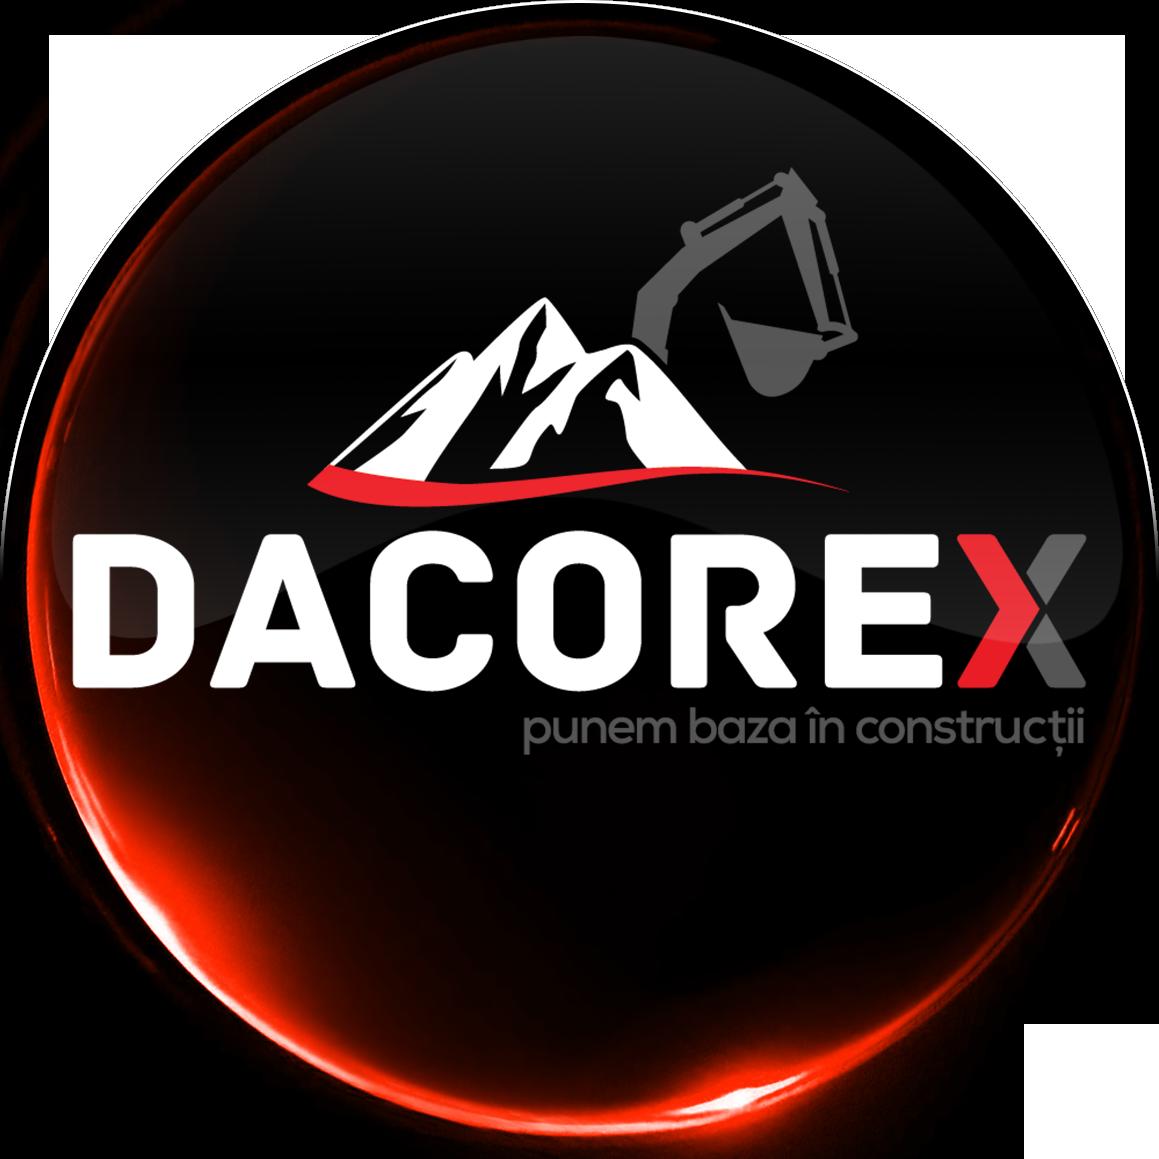 DACOREX